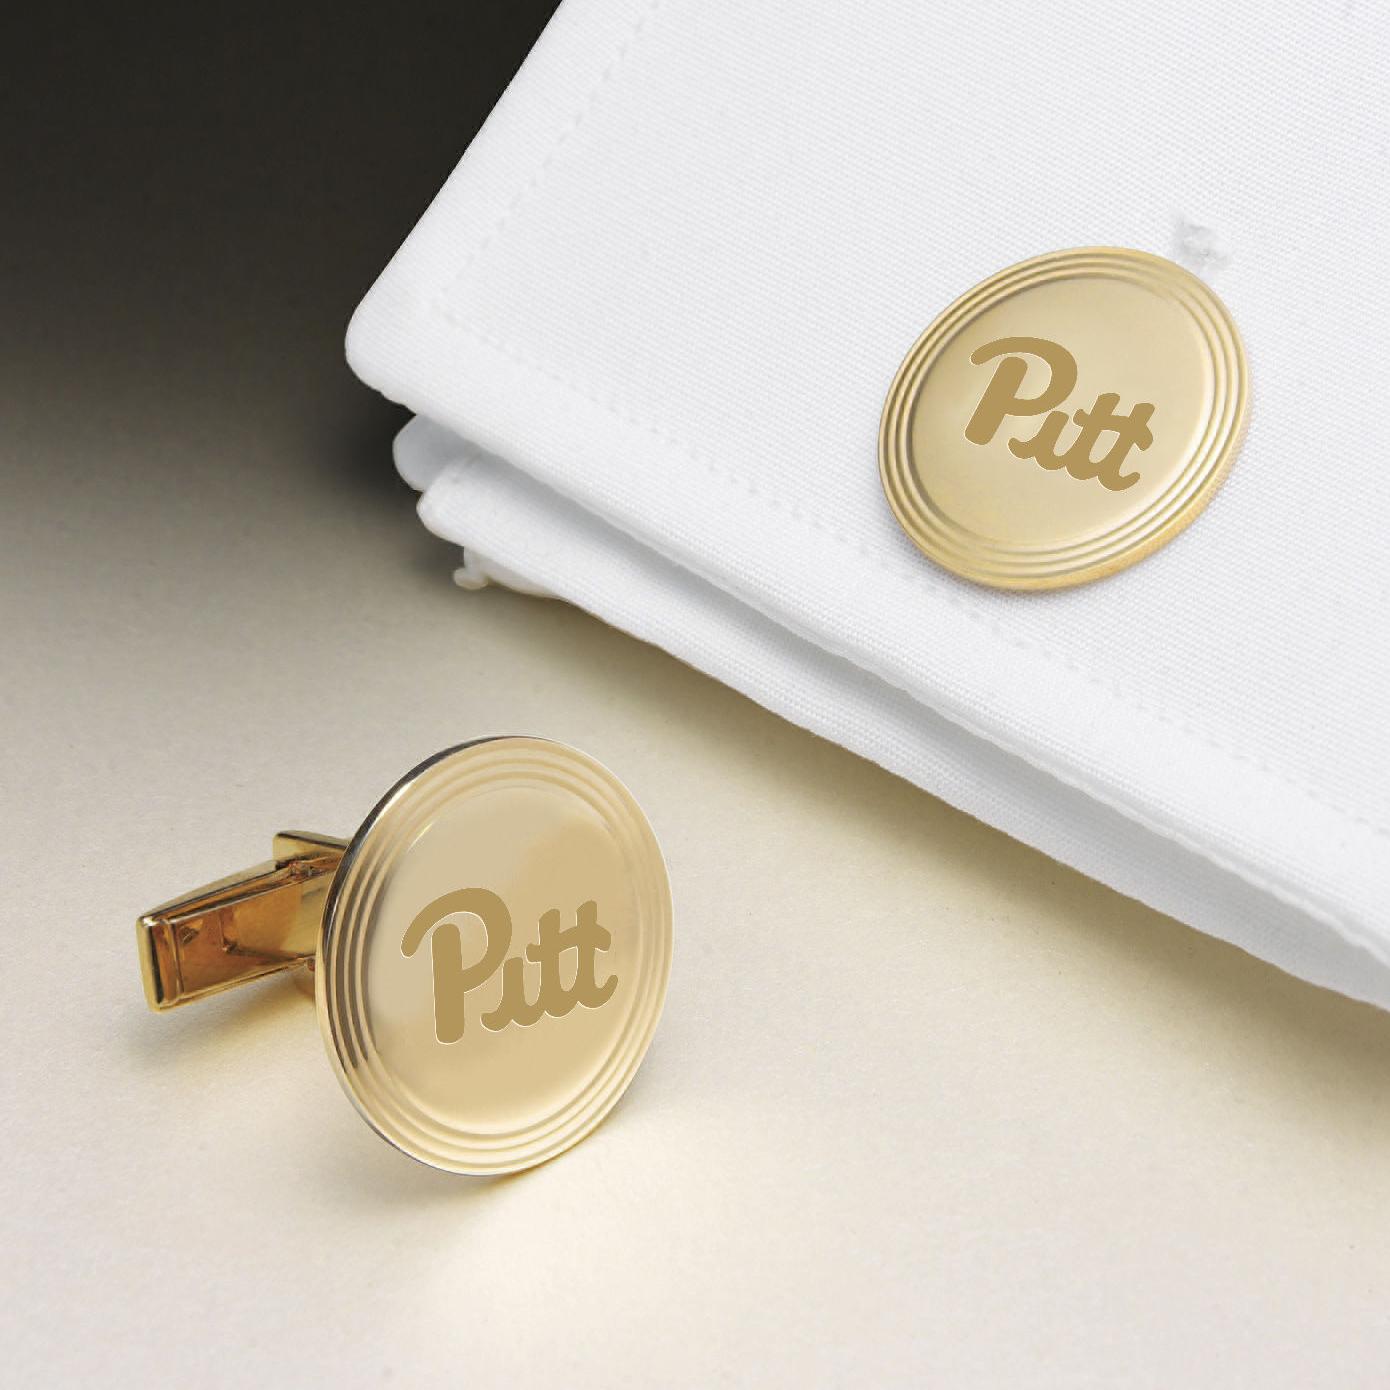 Pittsburgh 14K Gold Cufflinks